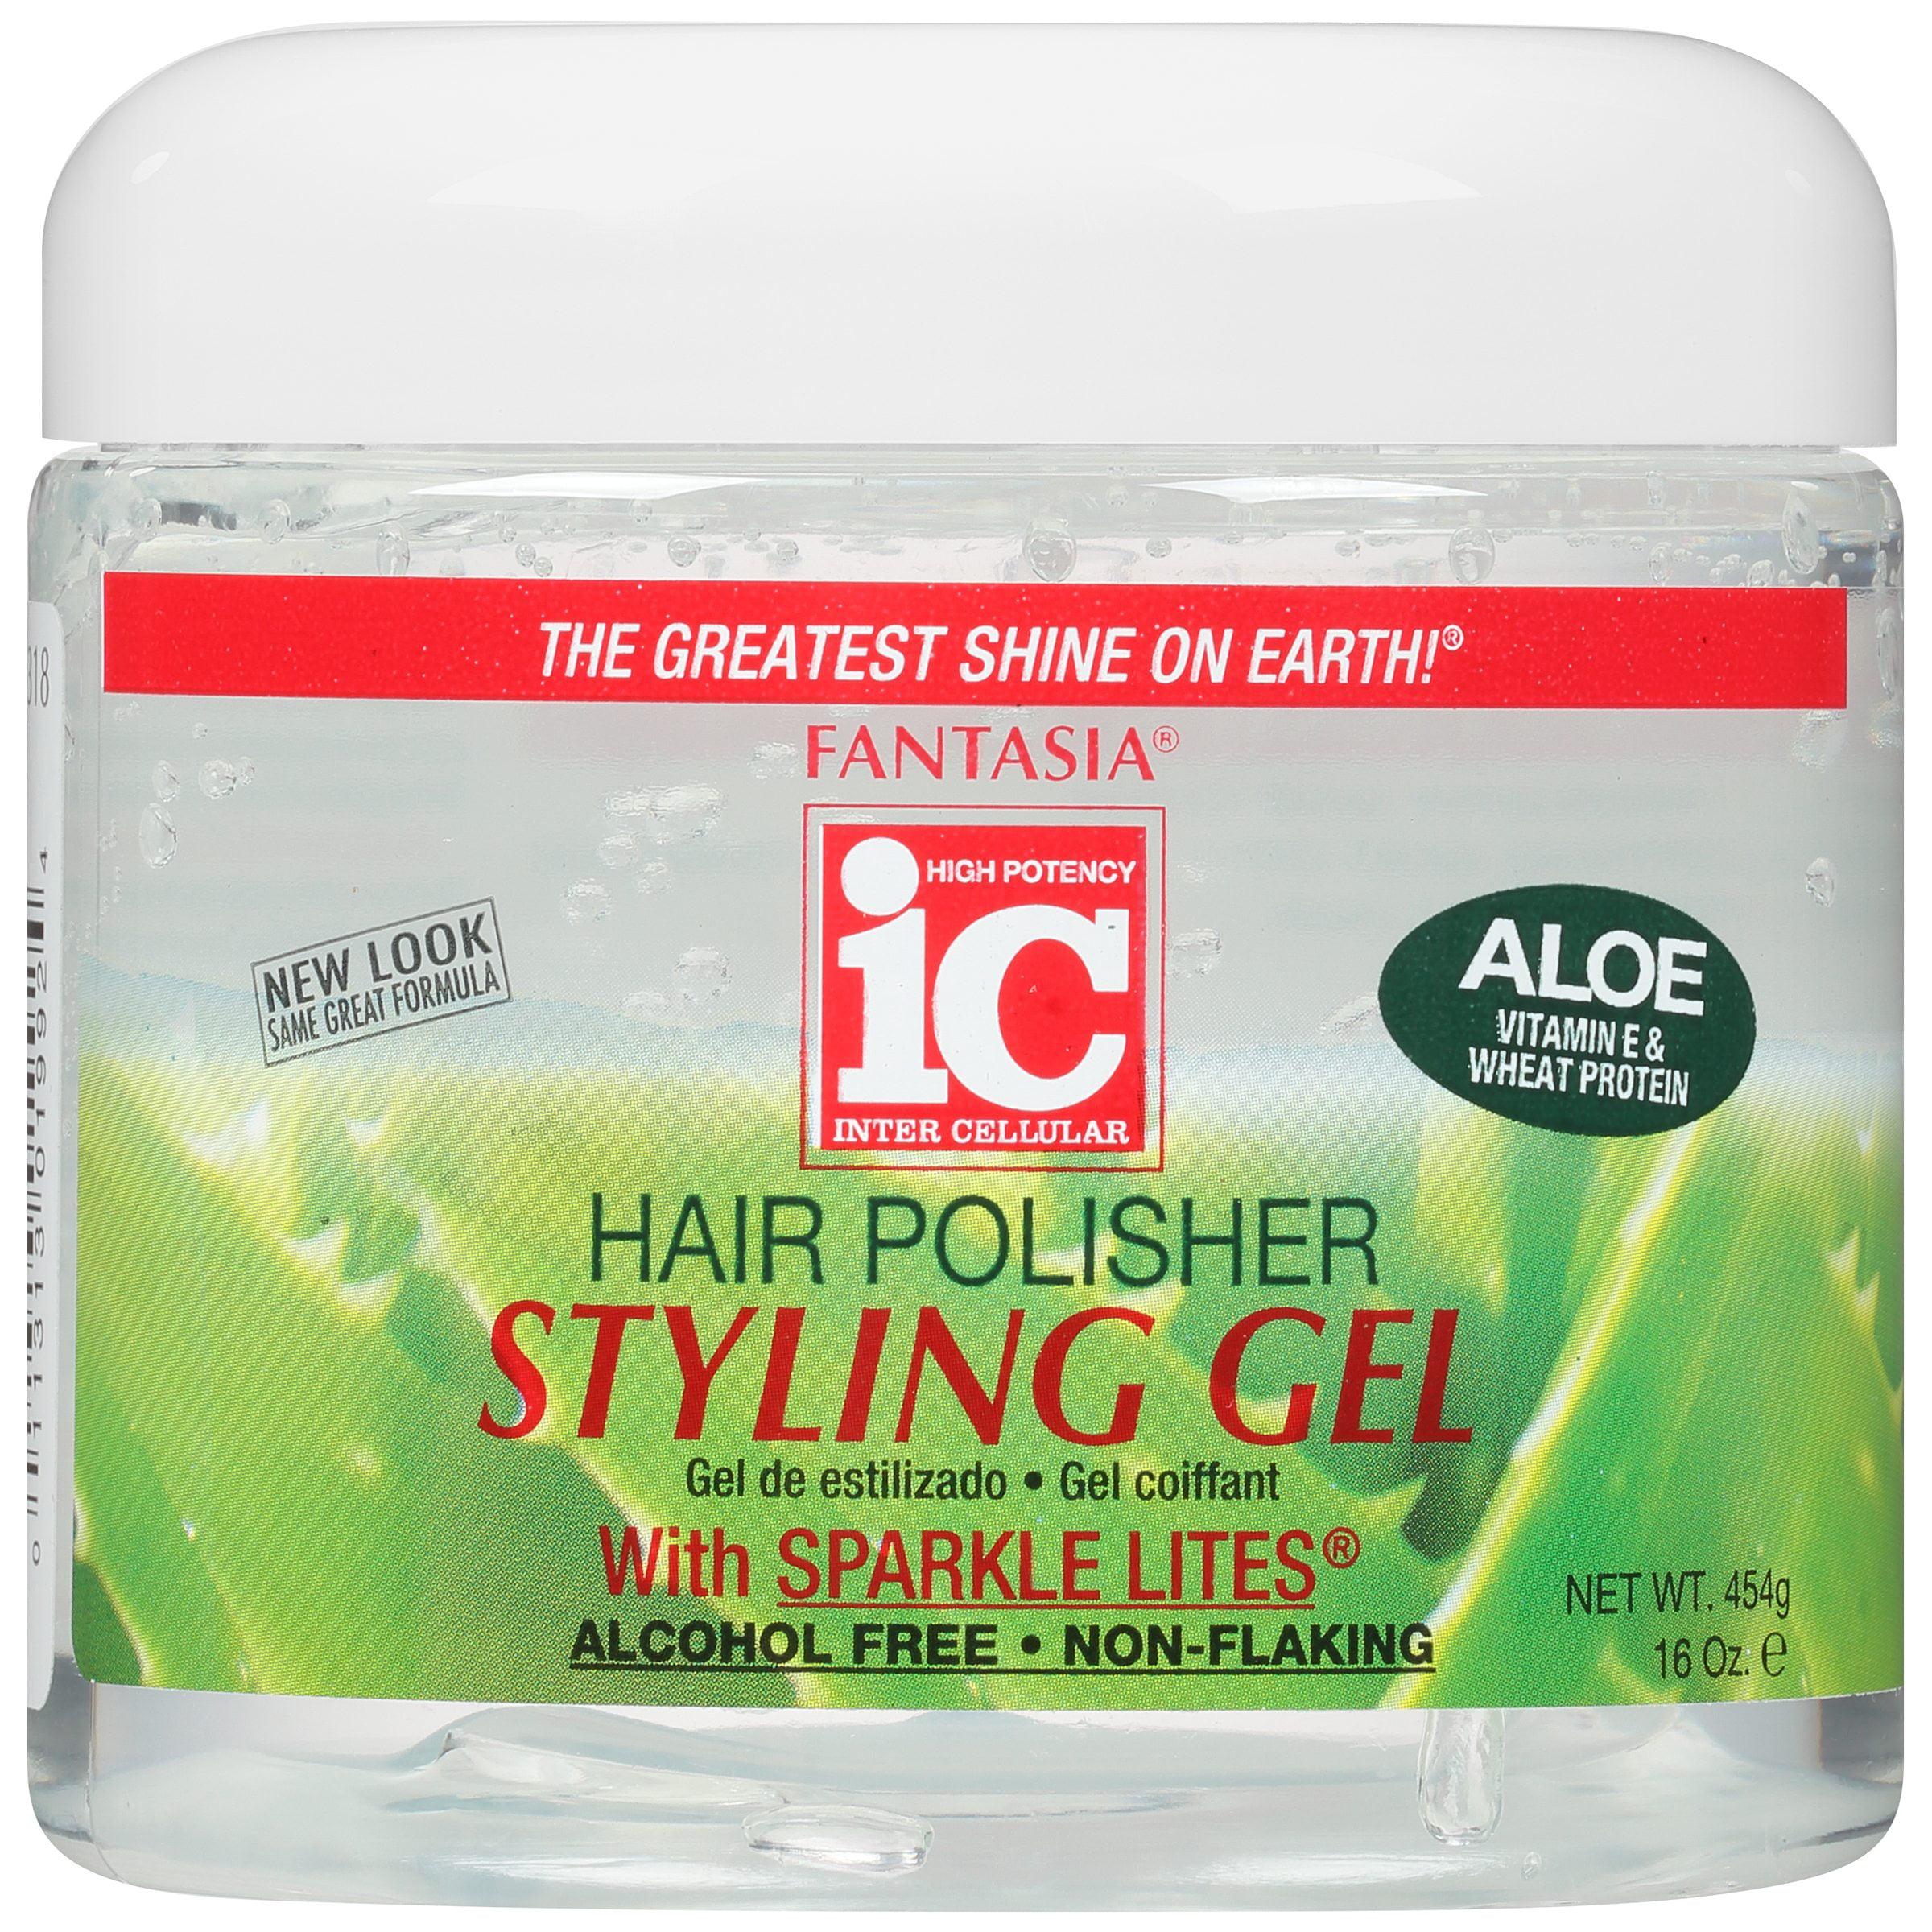 Fantasia Ic Hair Polisher With Sparkling Lites Styling Gel 16 0 Oz Walmart Com Walmart Com